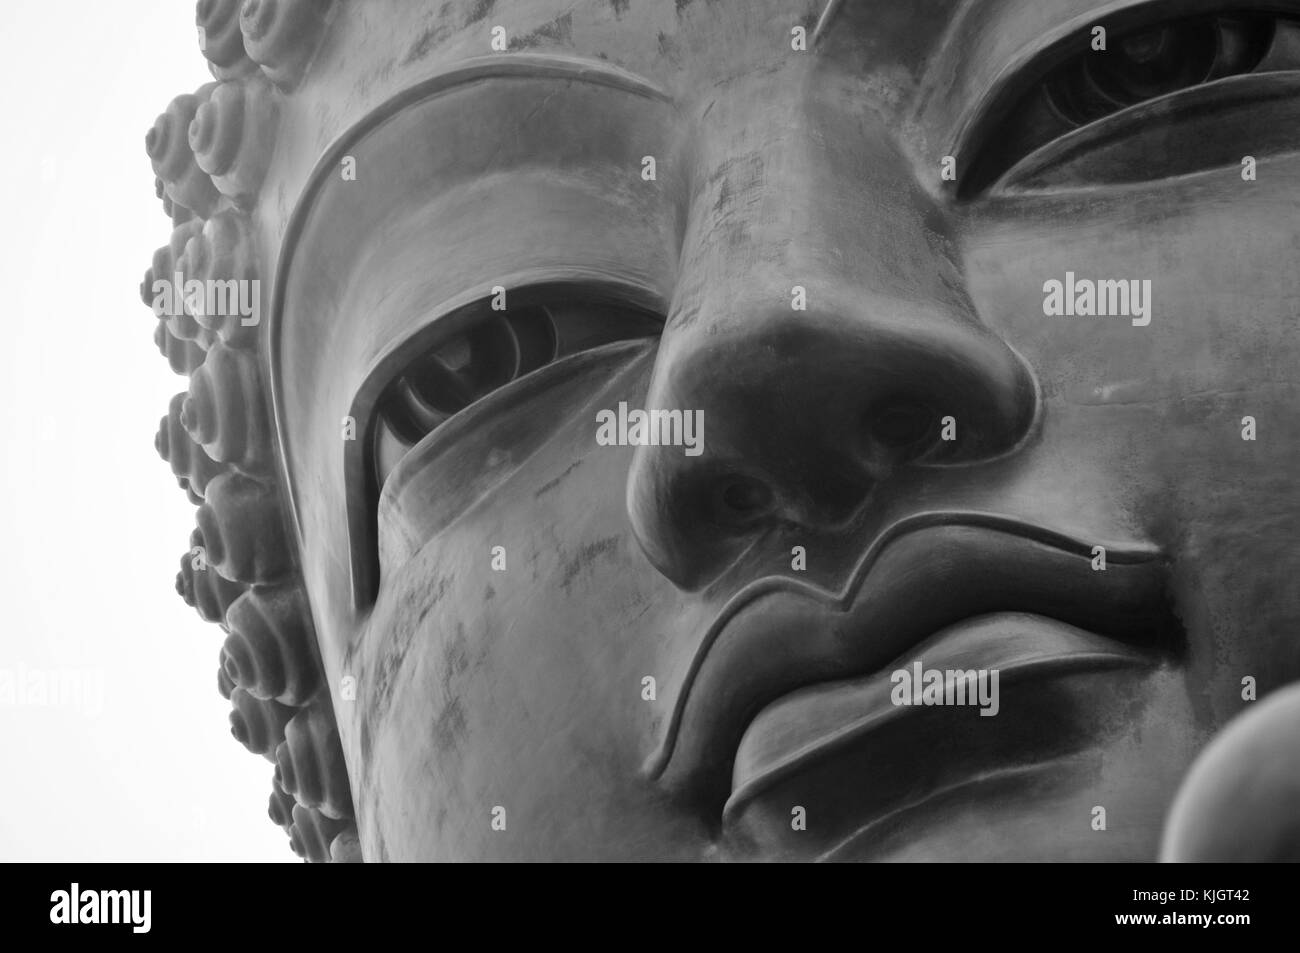 Tian Tan Buddha of Hong Kong shrouded in fog. - Stock Image